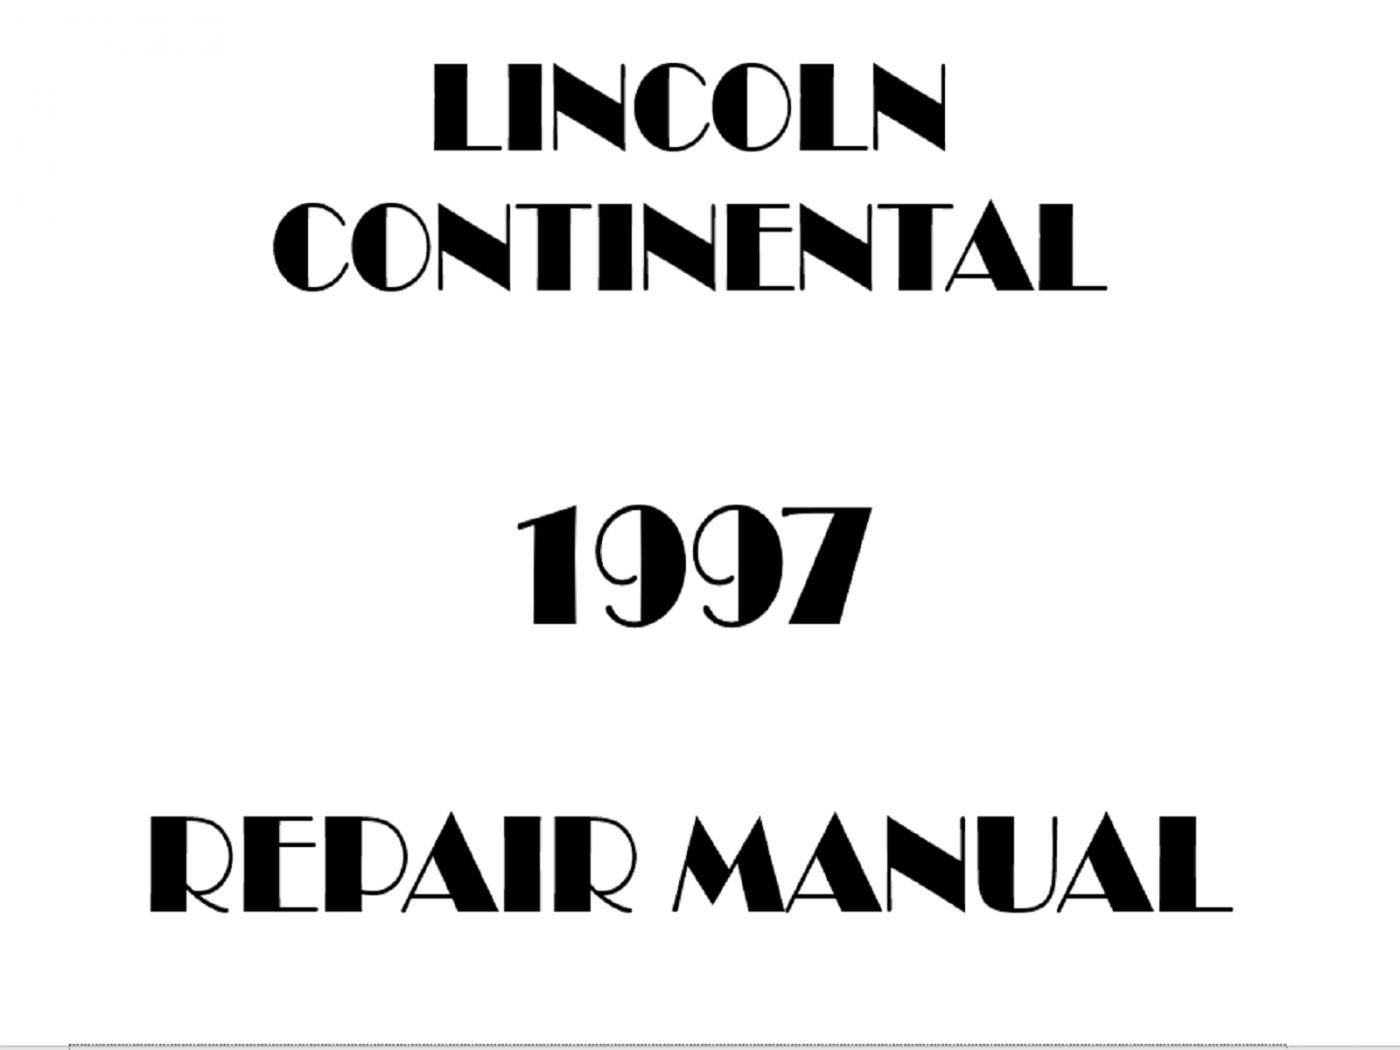 1997 Lincoln Continental repair manual